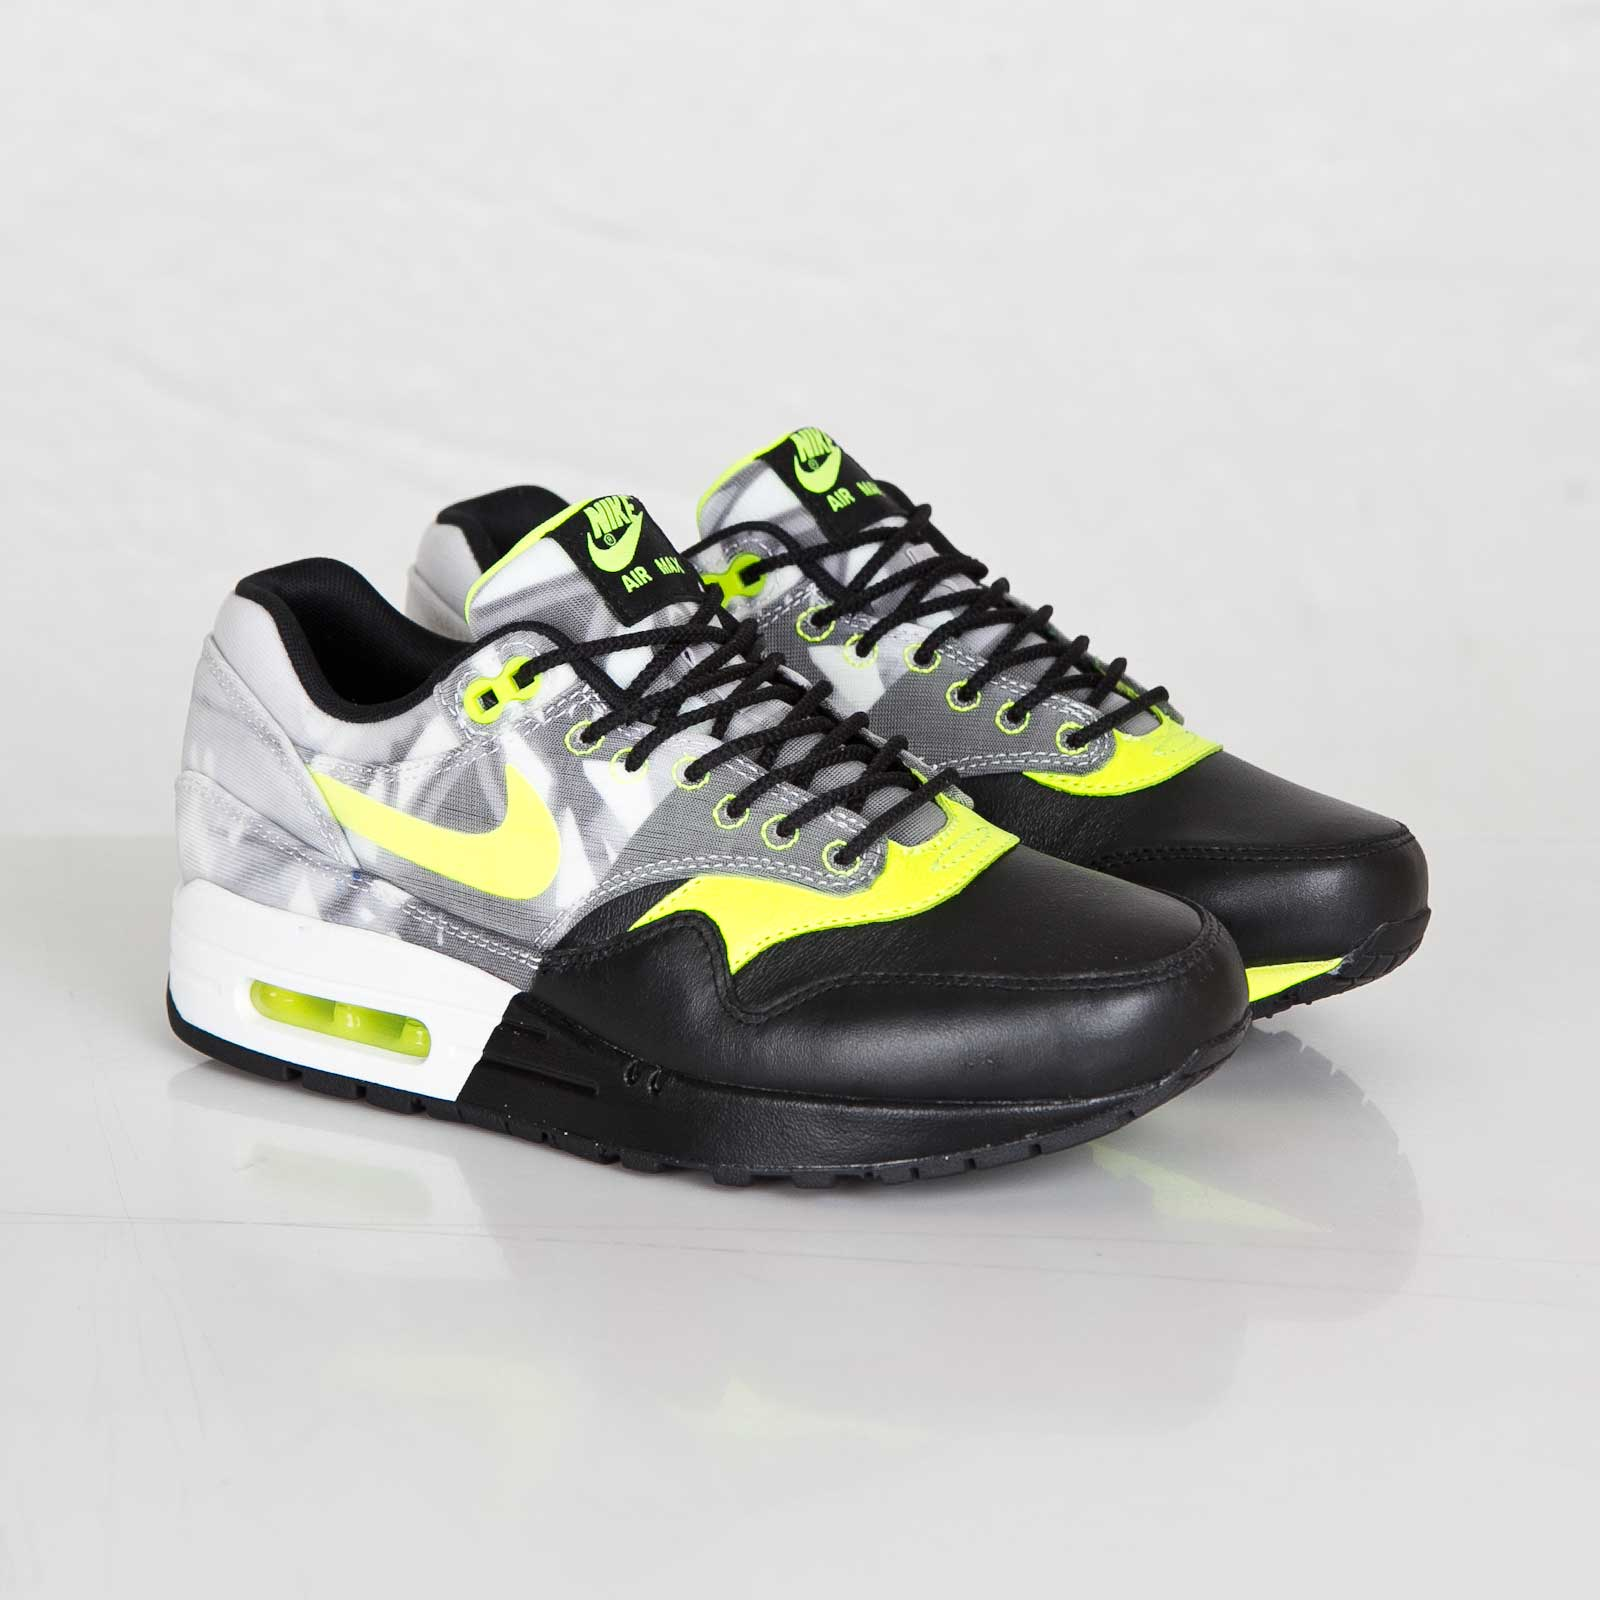 best service bb0d6 3c812 Nike Wmns Air Max 1 FV QS